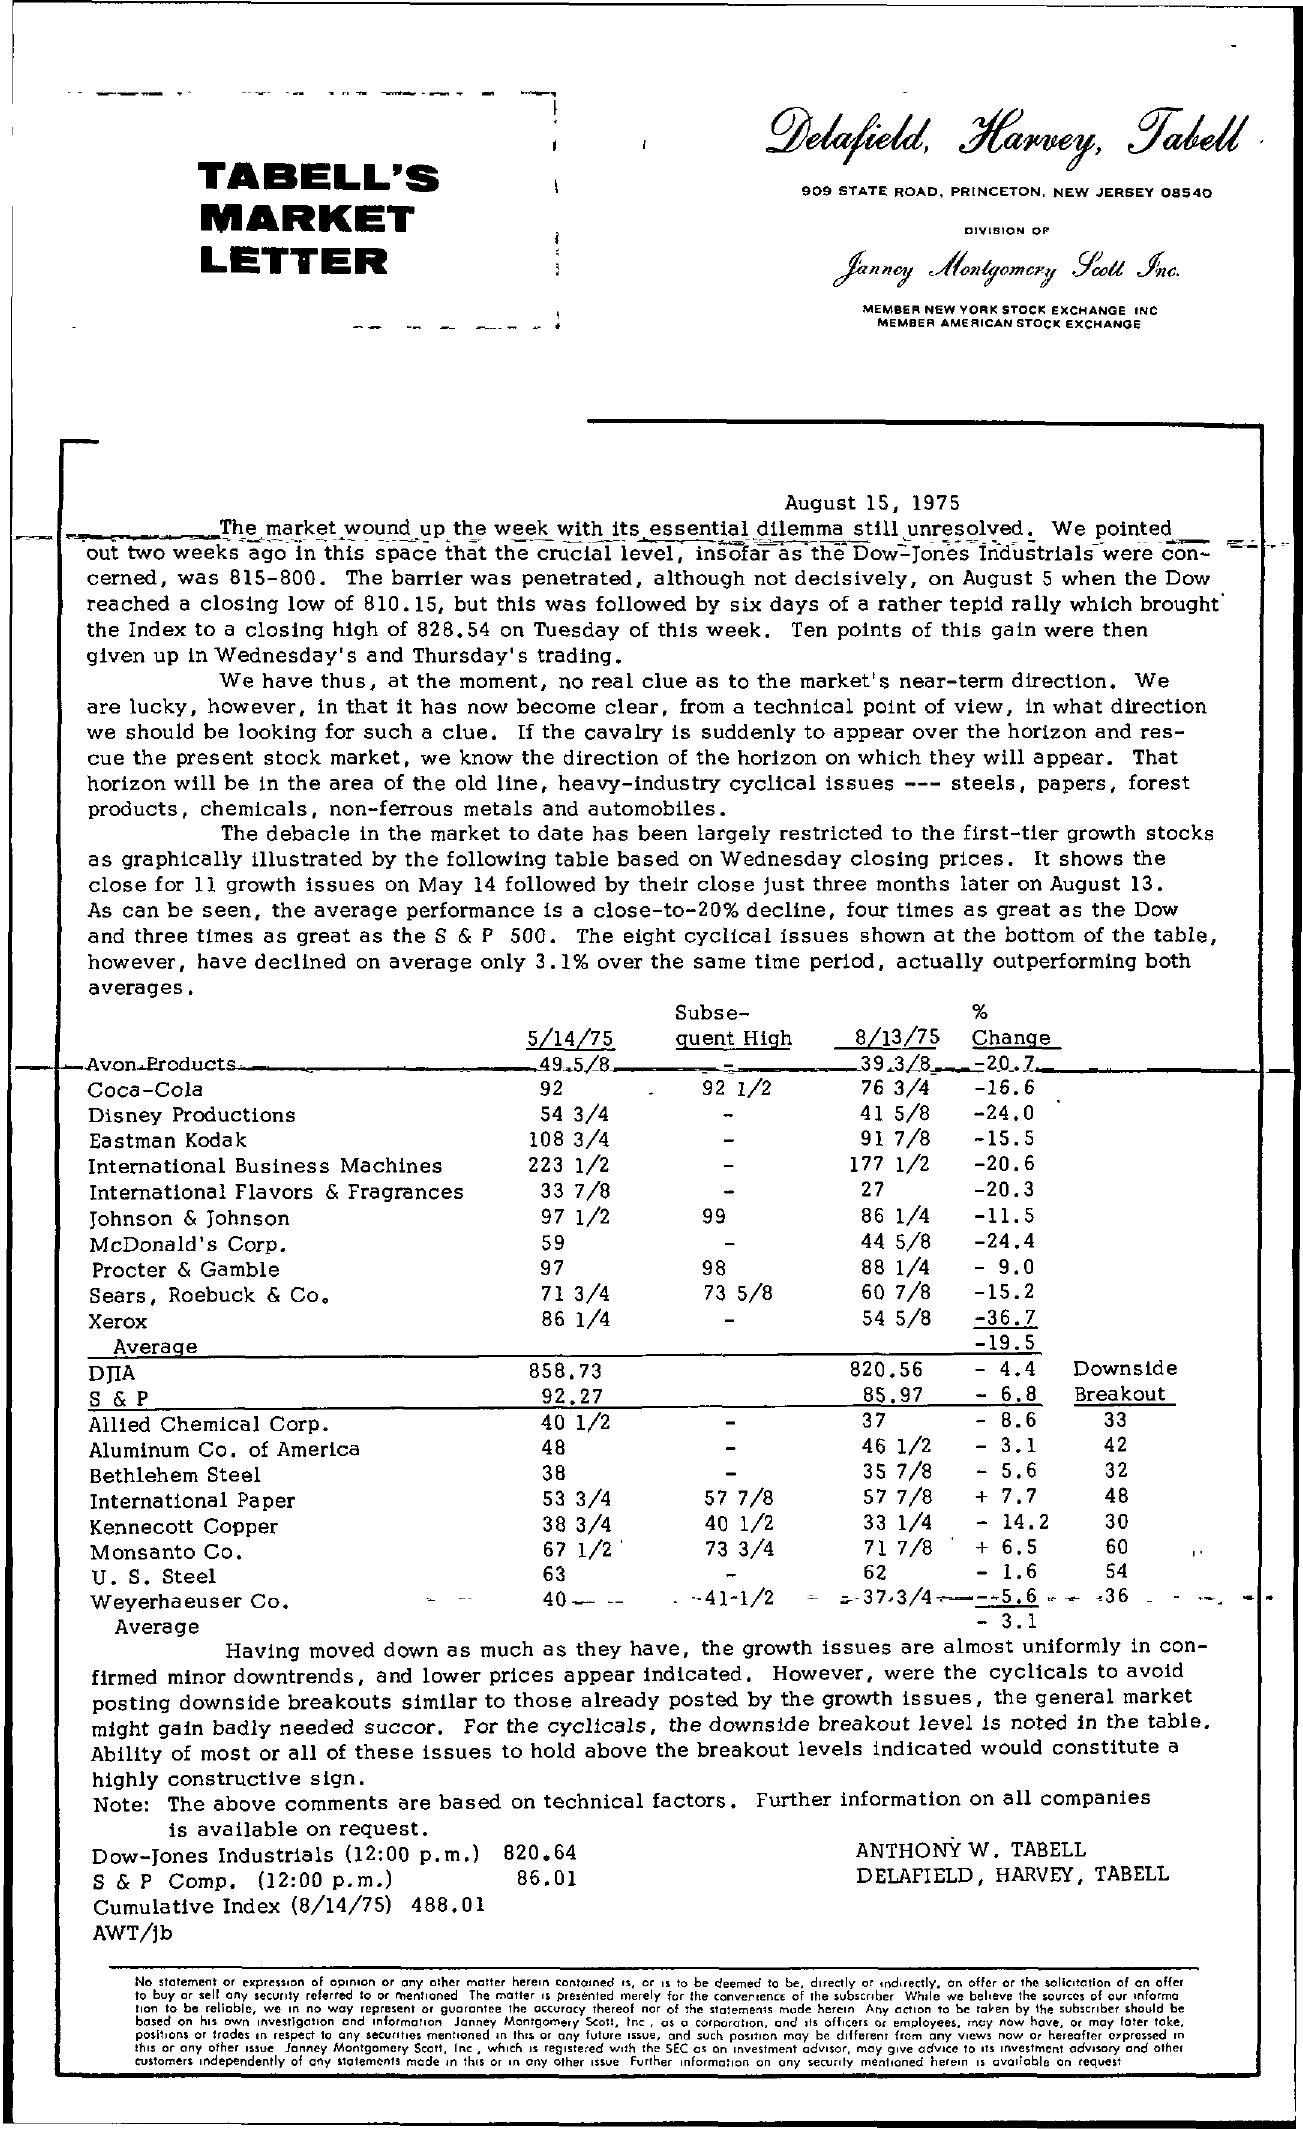 Tabell's Market Letter - August 15, 1975